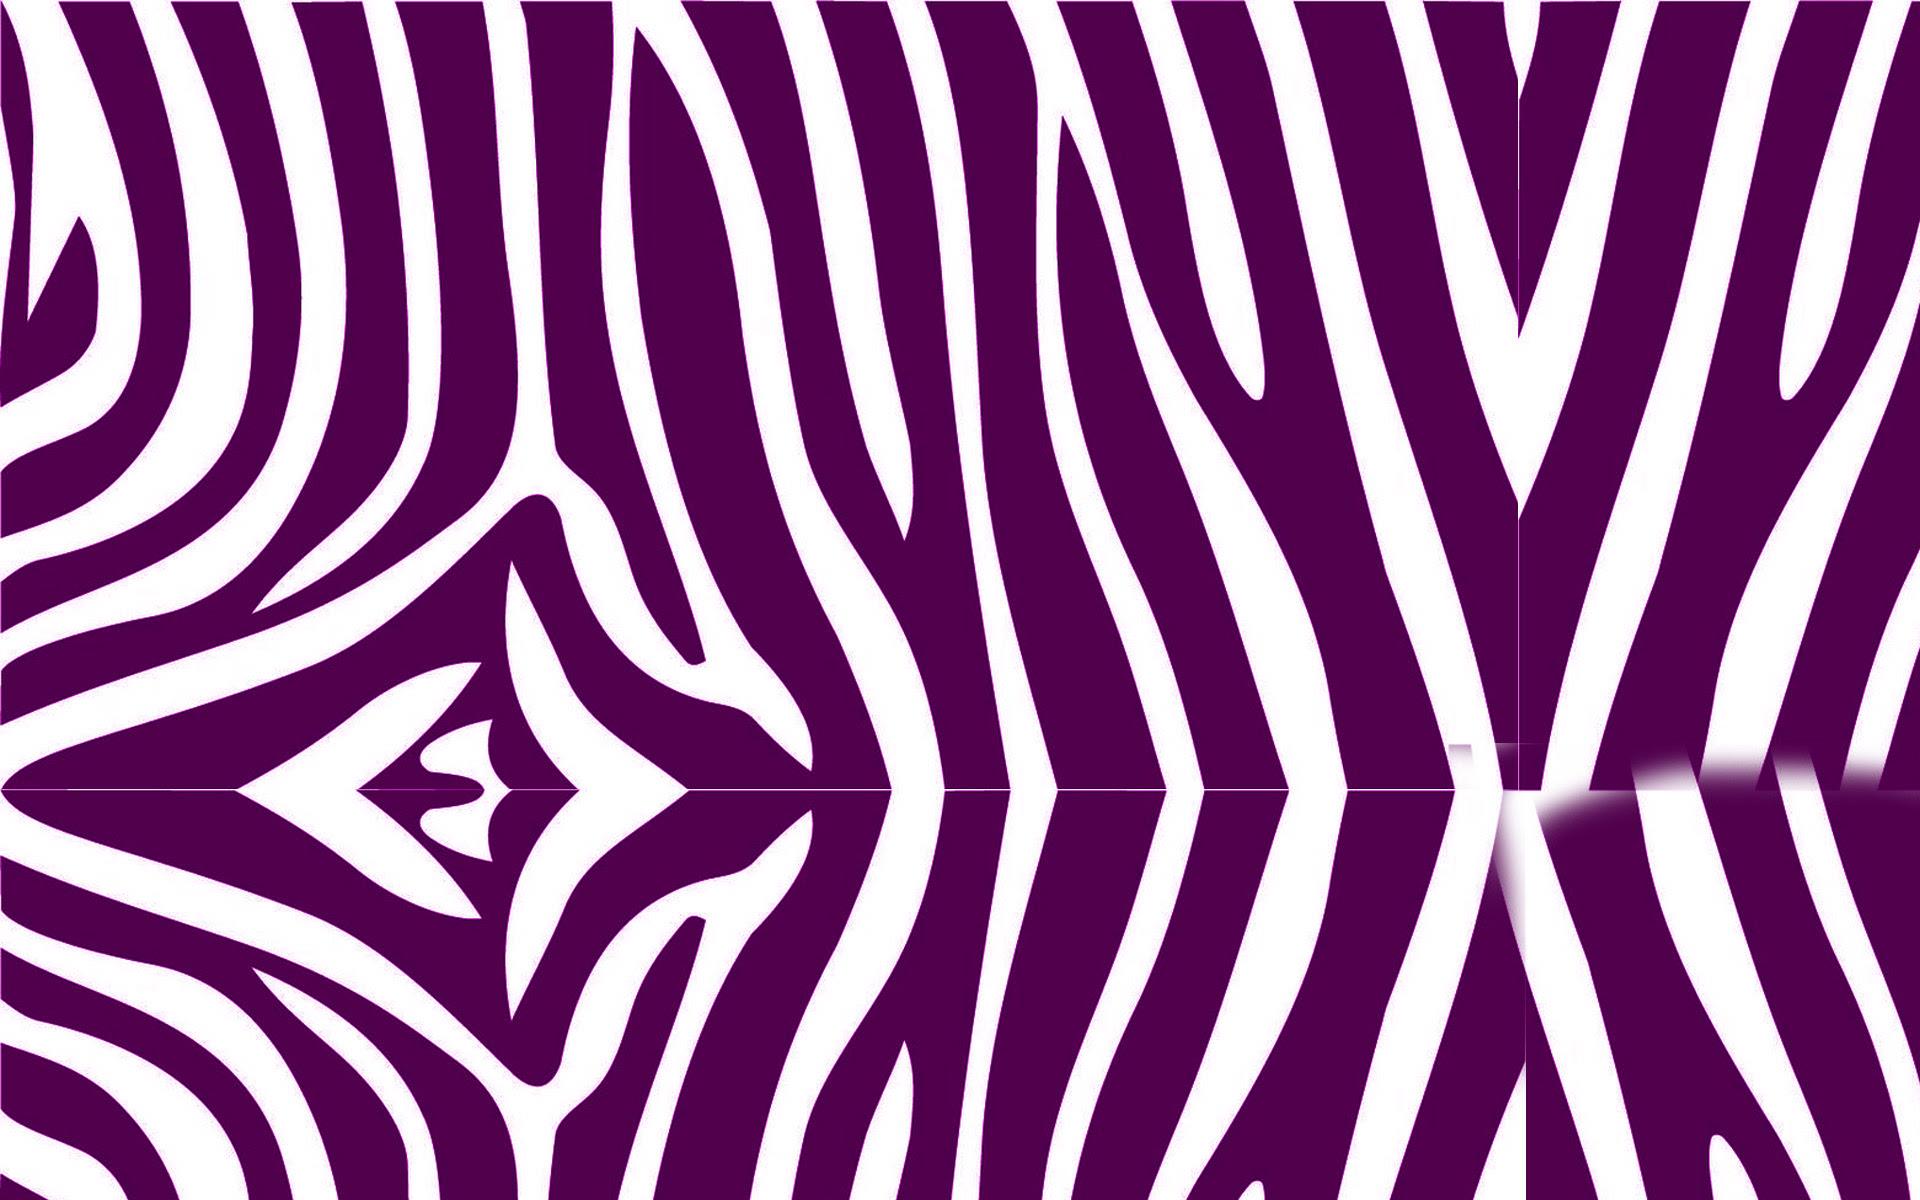 Zebra Print Wallpaper 46 Wallpapers HD Wallpapers